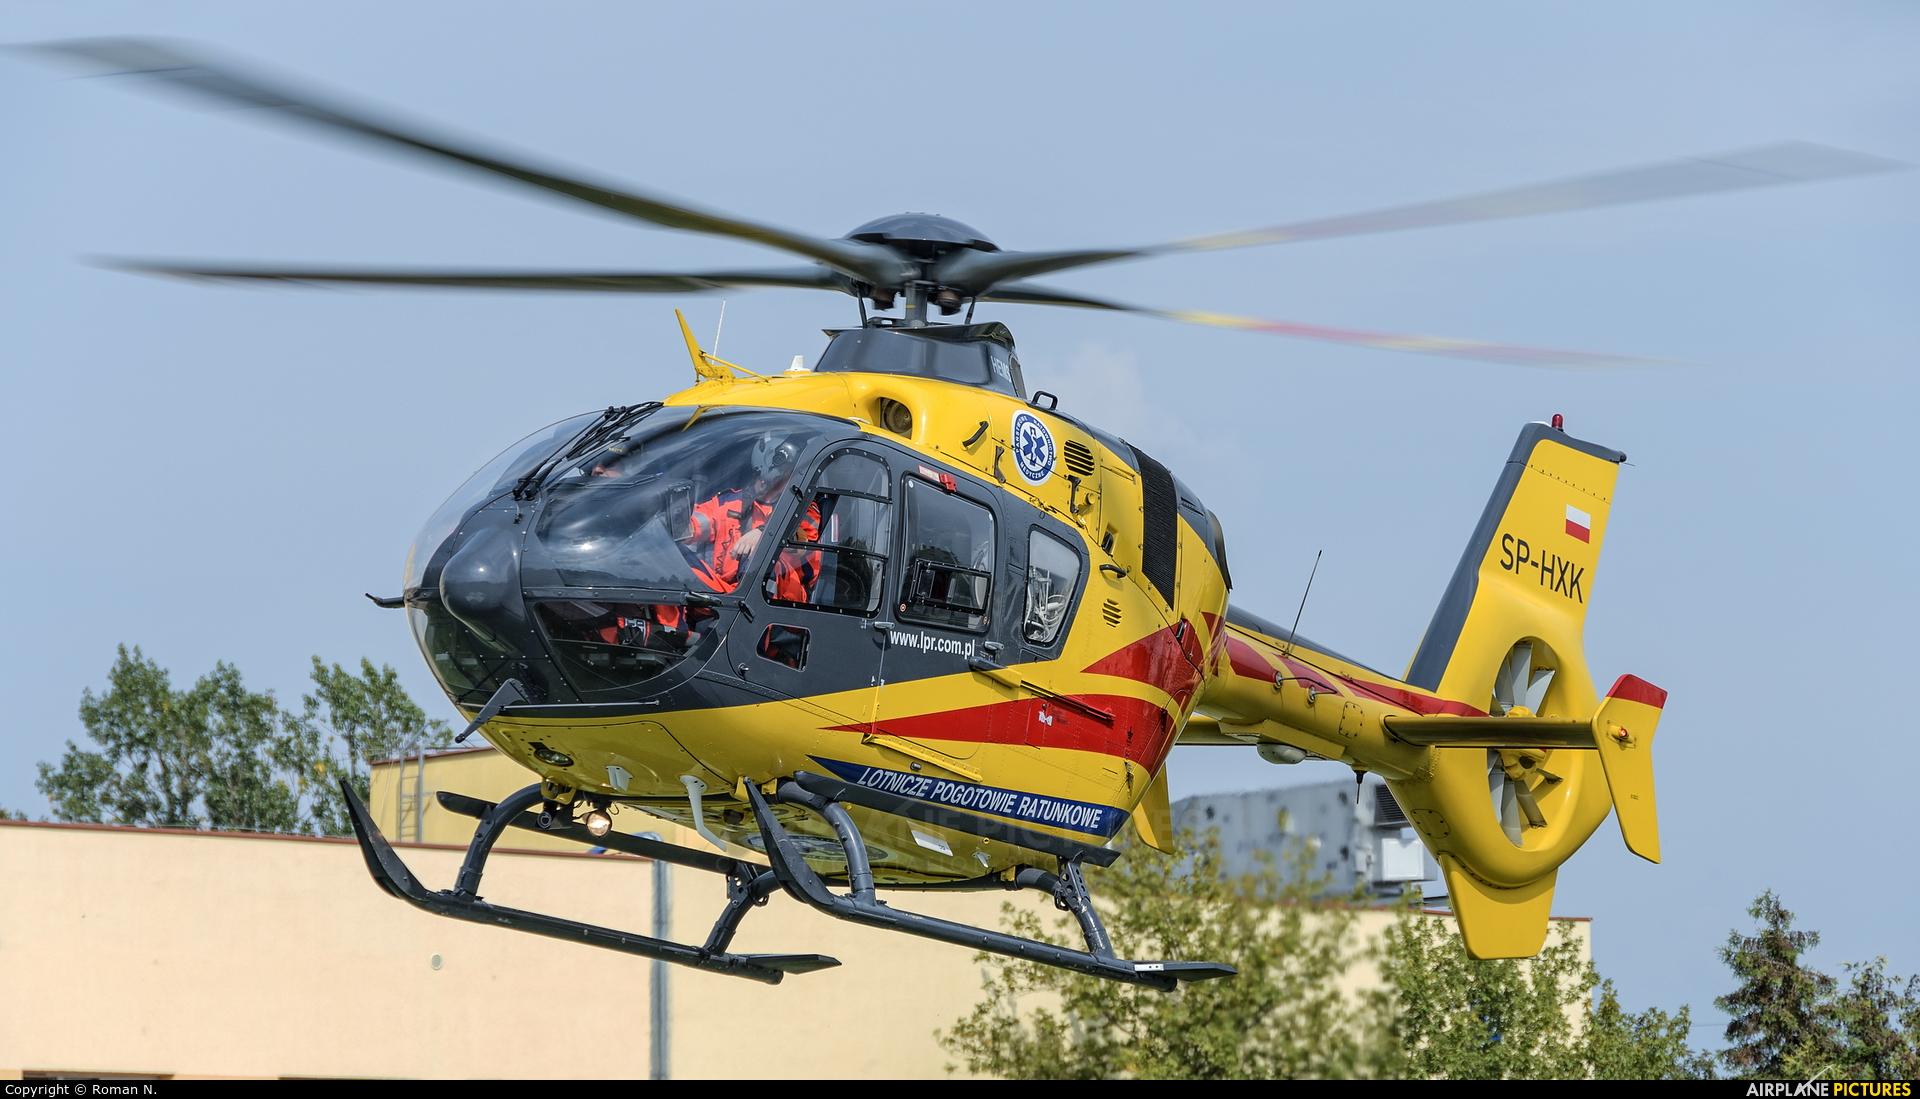 Polish Medical Air Rescue - Lotnicze Pogotowie Ratunkowe SP-HXK aircraft at Bydgoszcz - Off Airport